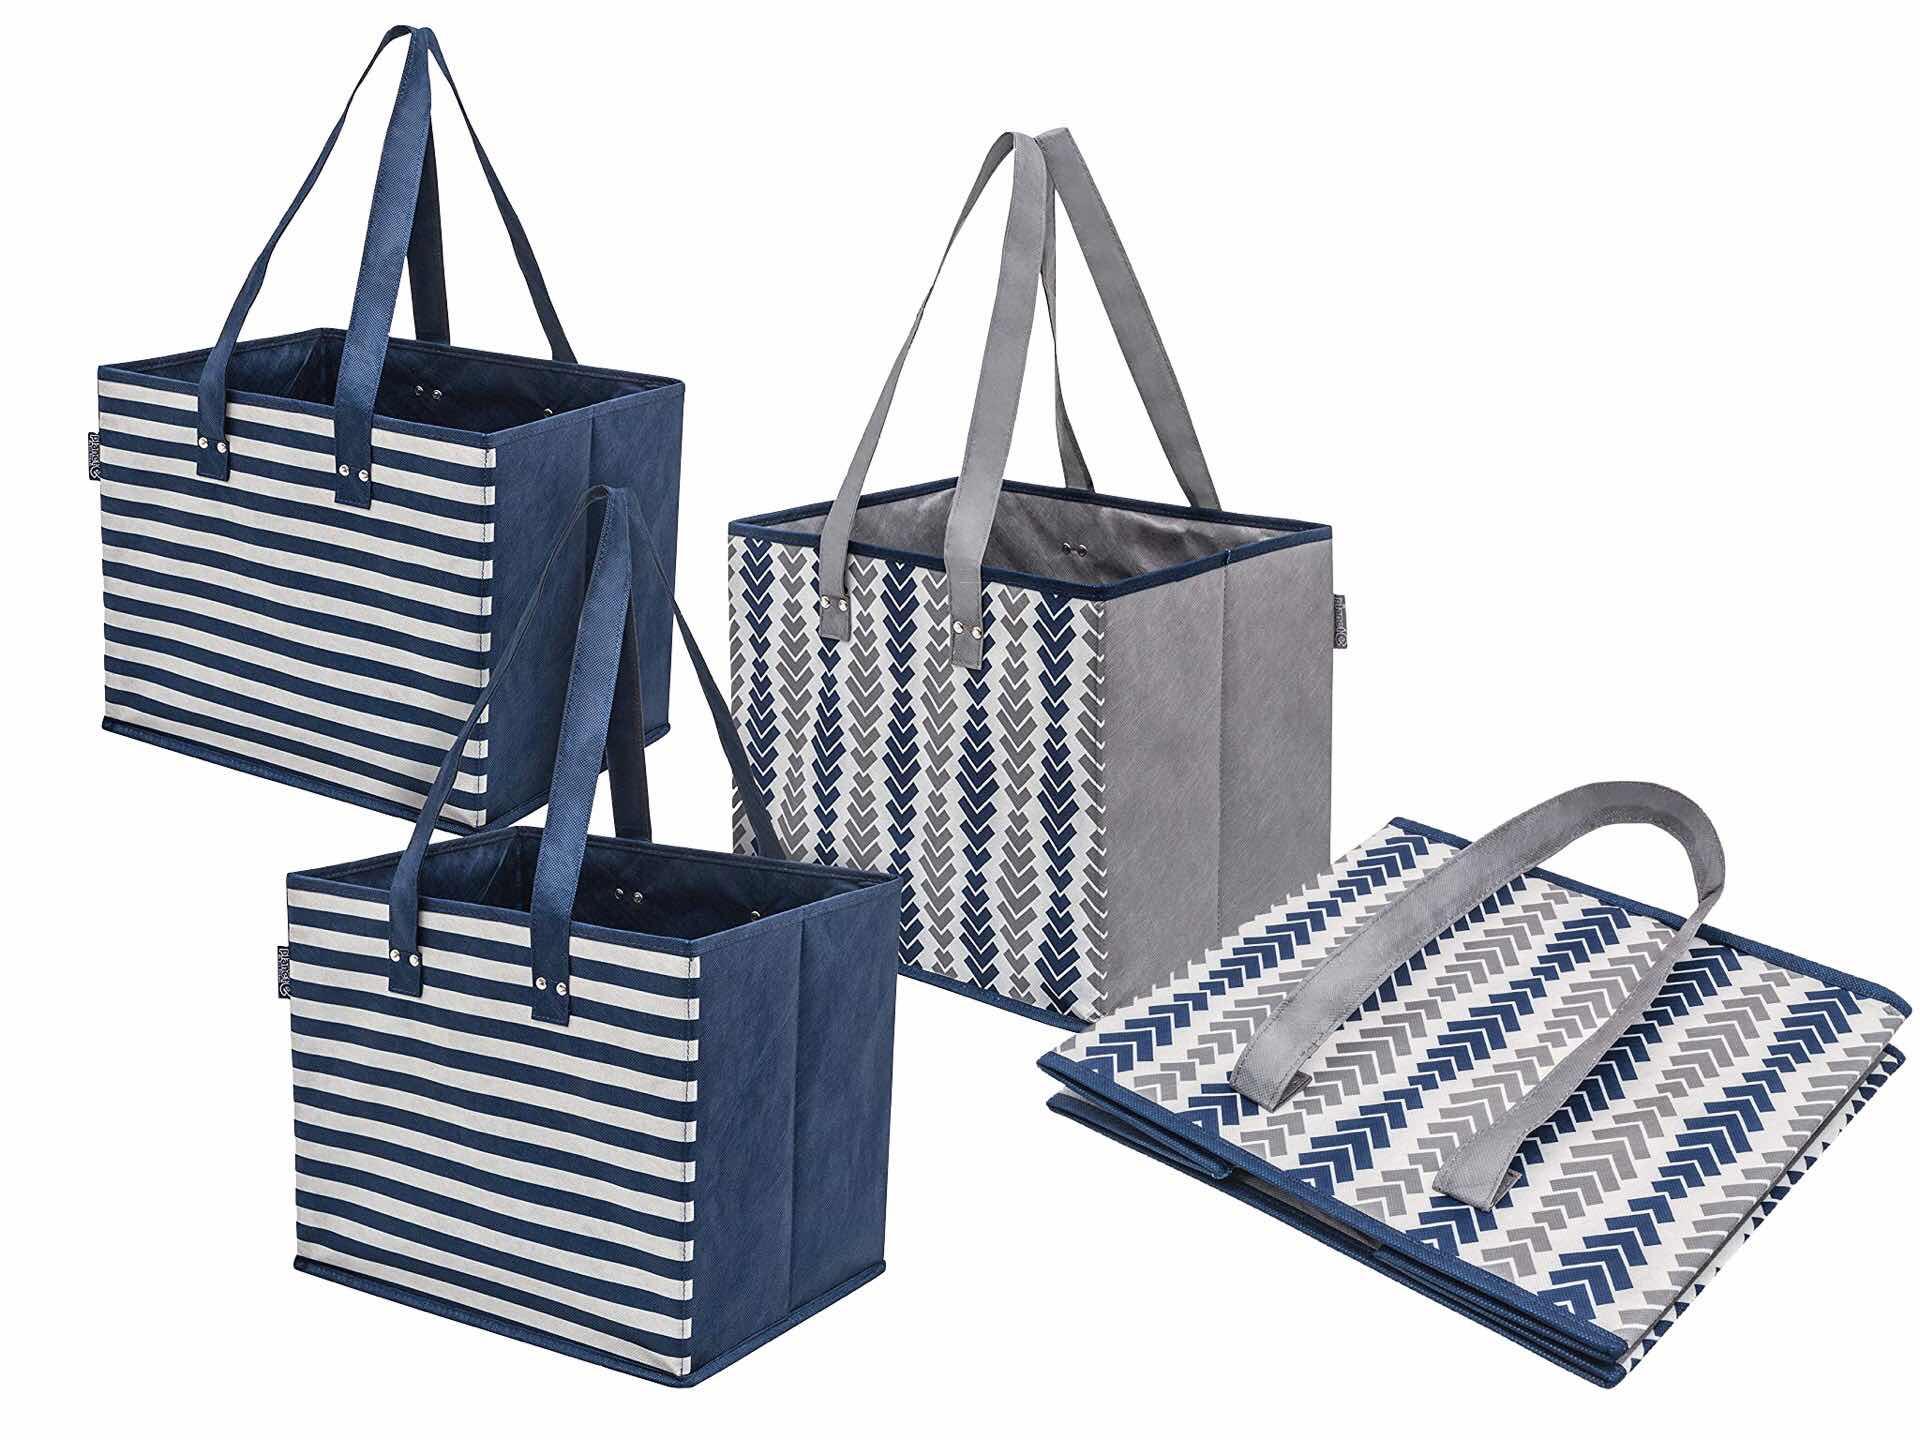 planet-e-reusable-grocery-shopping-bags